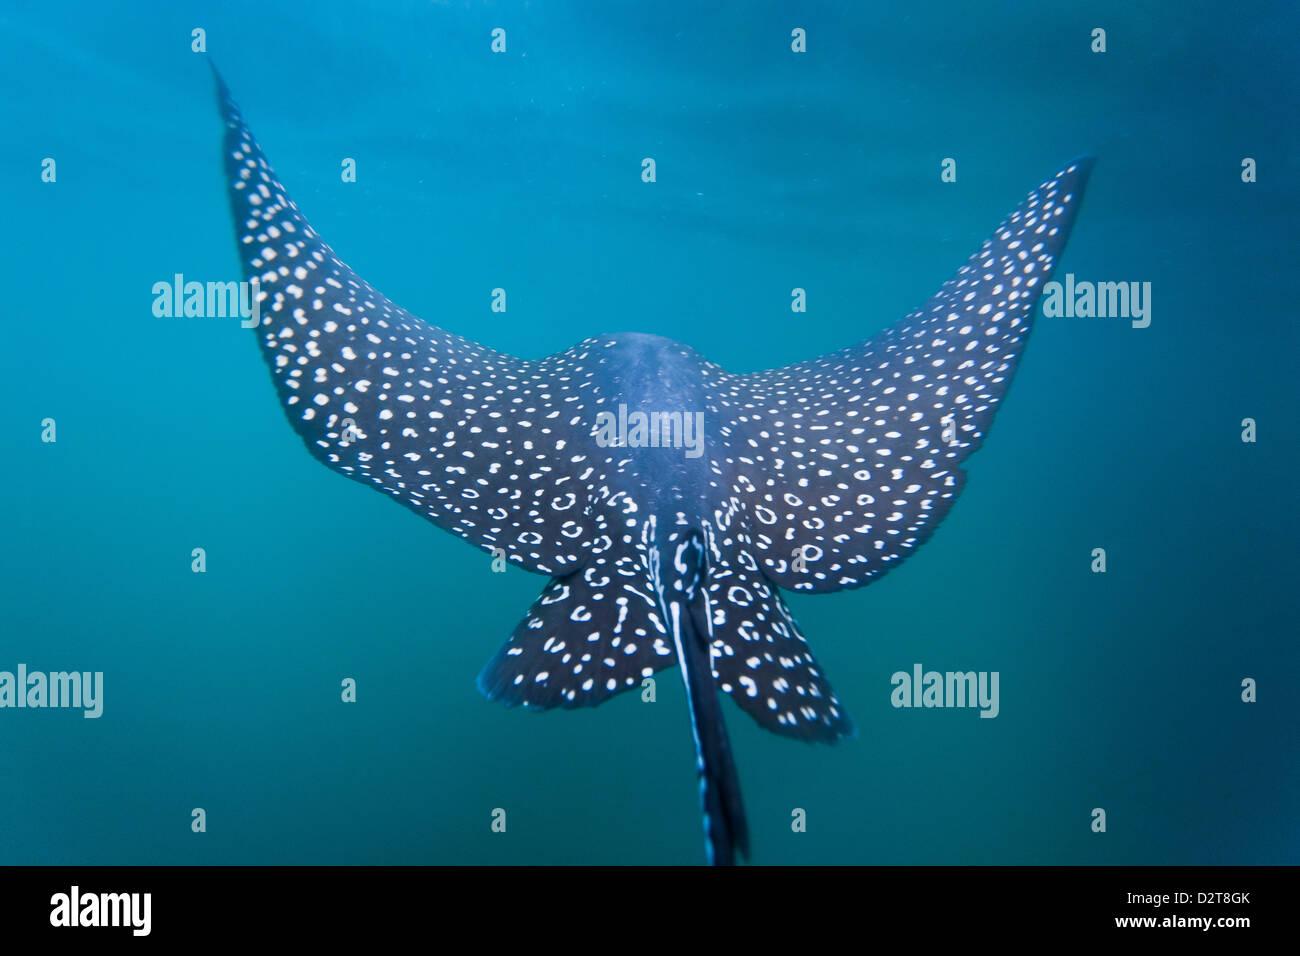 Spotted eagle ray (Aetobatus narinari) underwater, Leon Dormido Island, San Cristobal Island, Galapagos Islands, - Stock Image